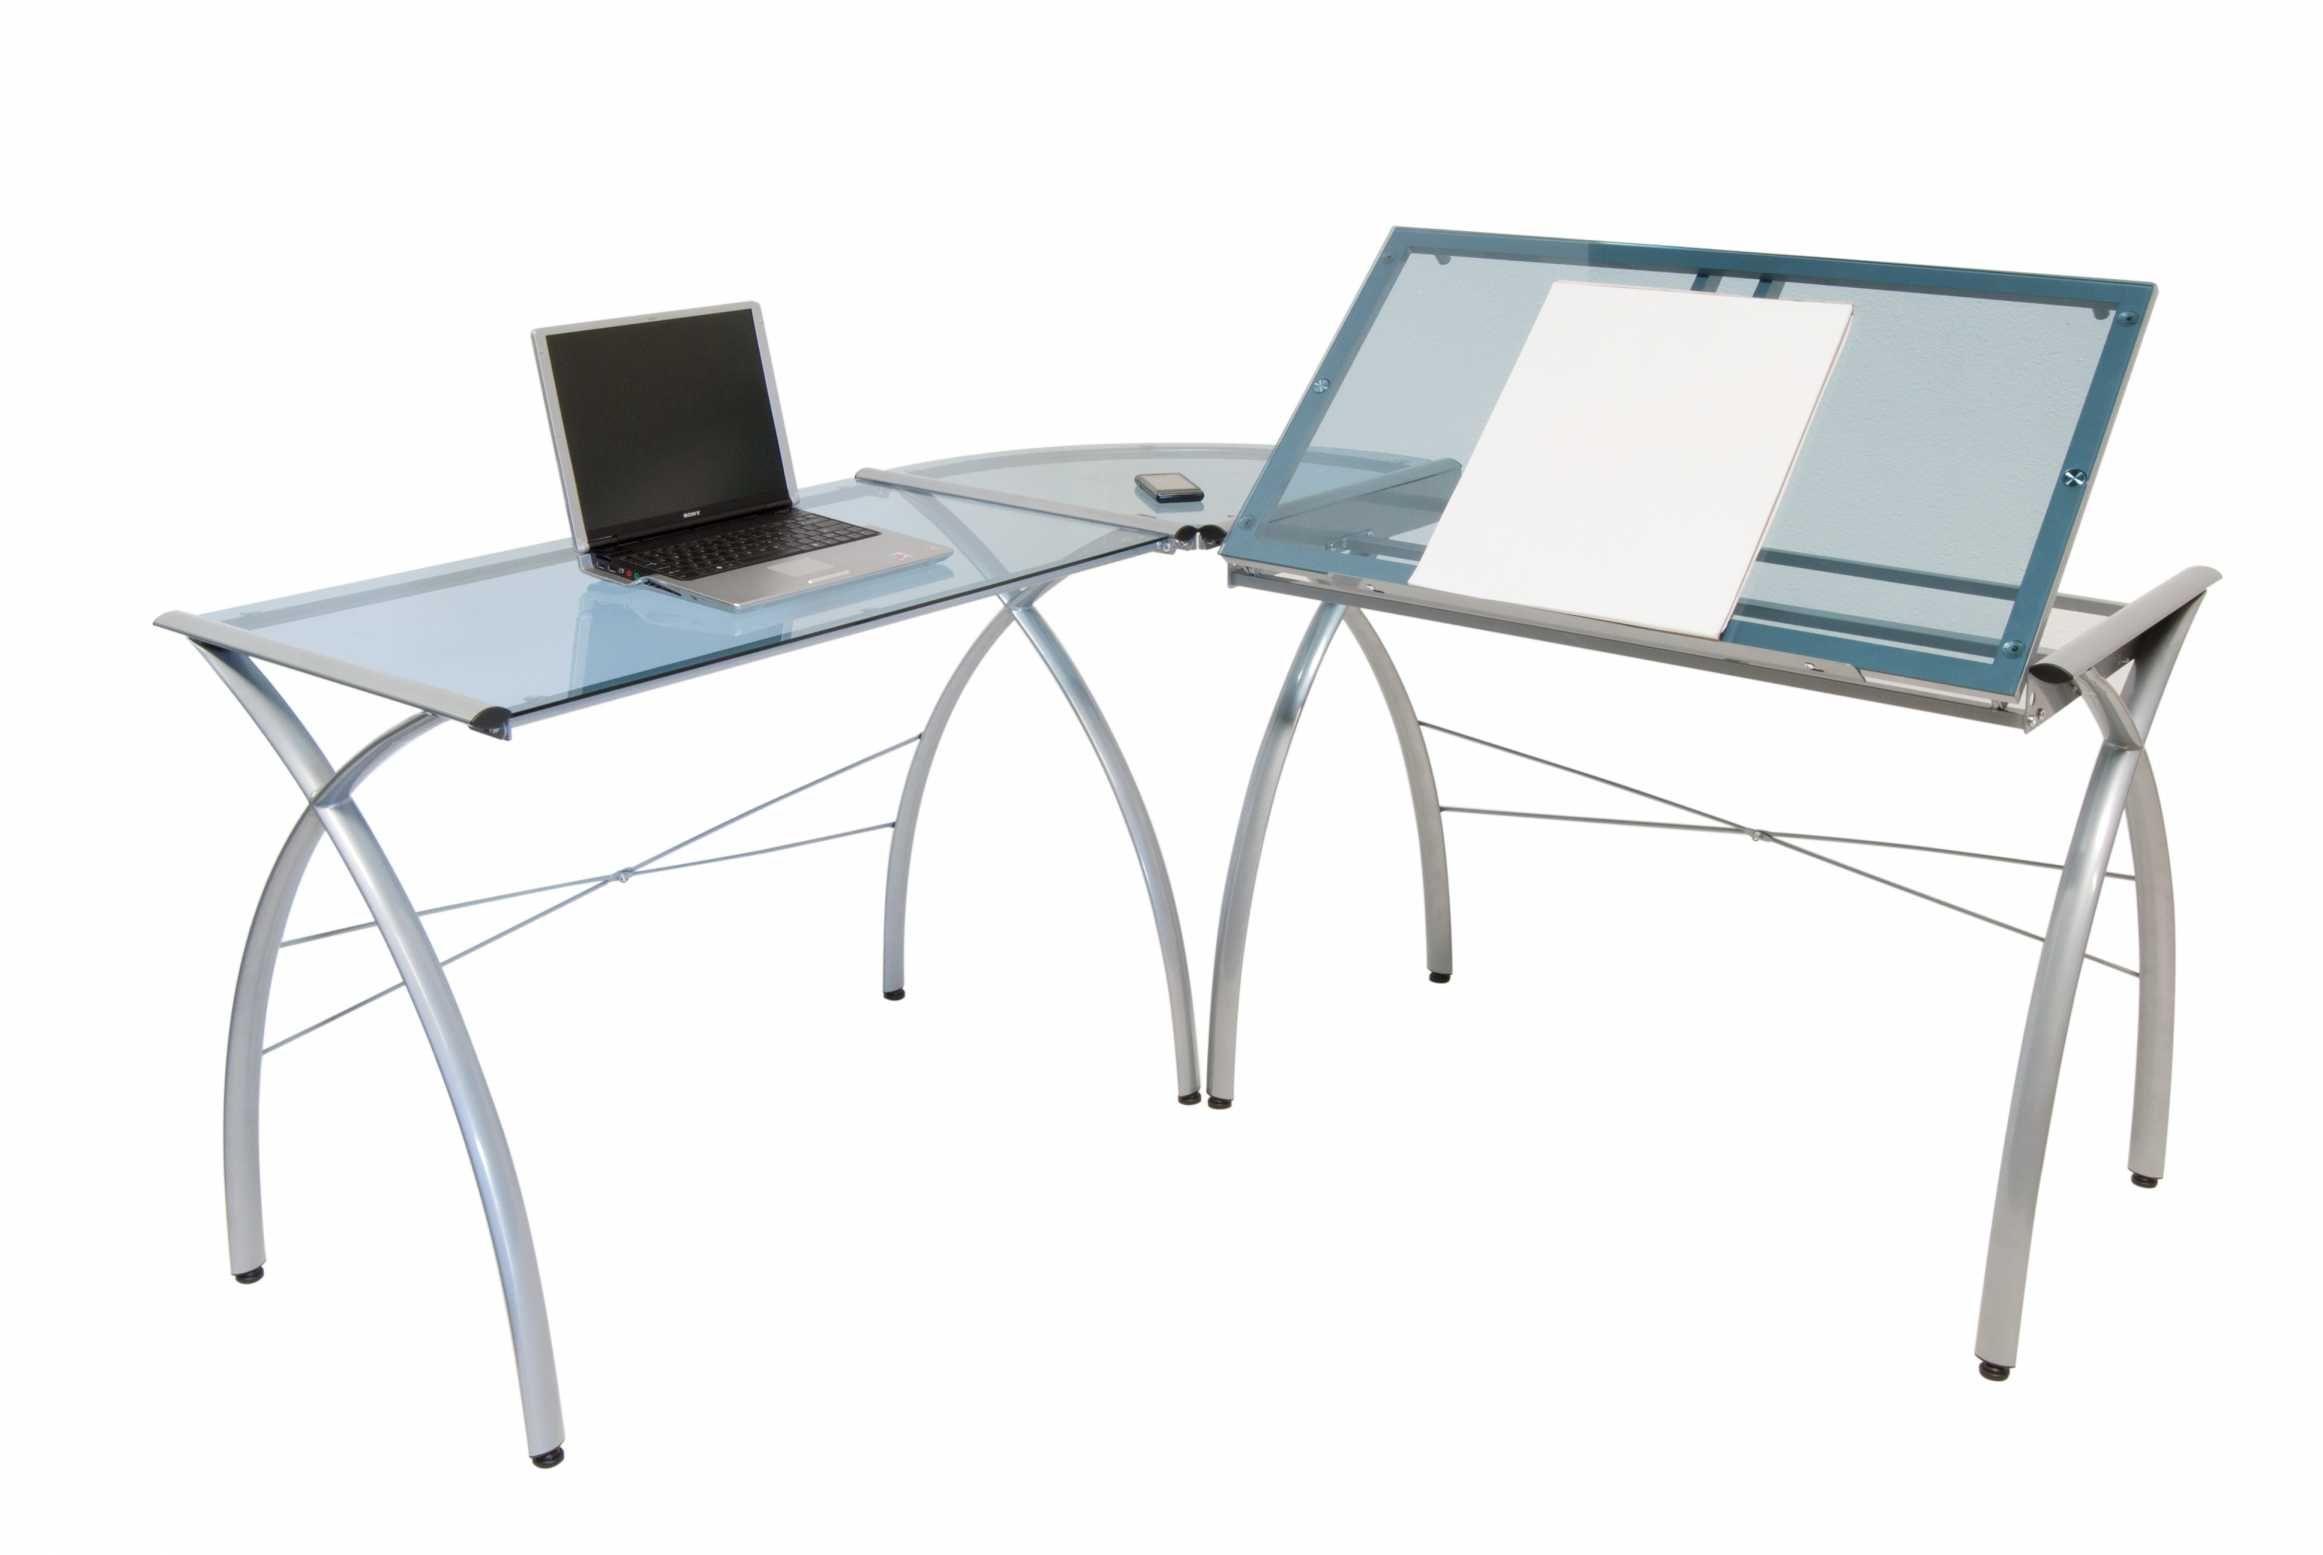 Staples l shaped desk new release staples l shaped desk new